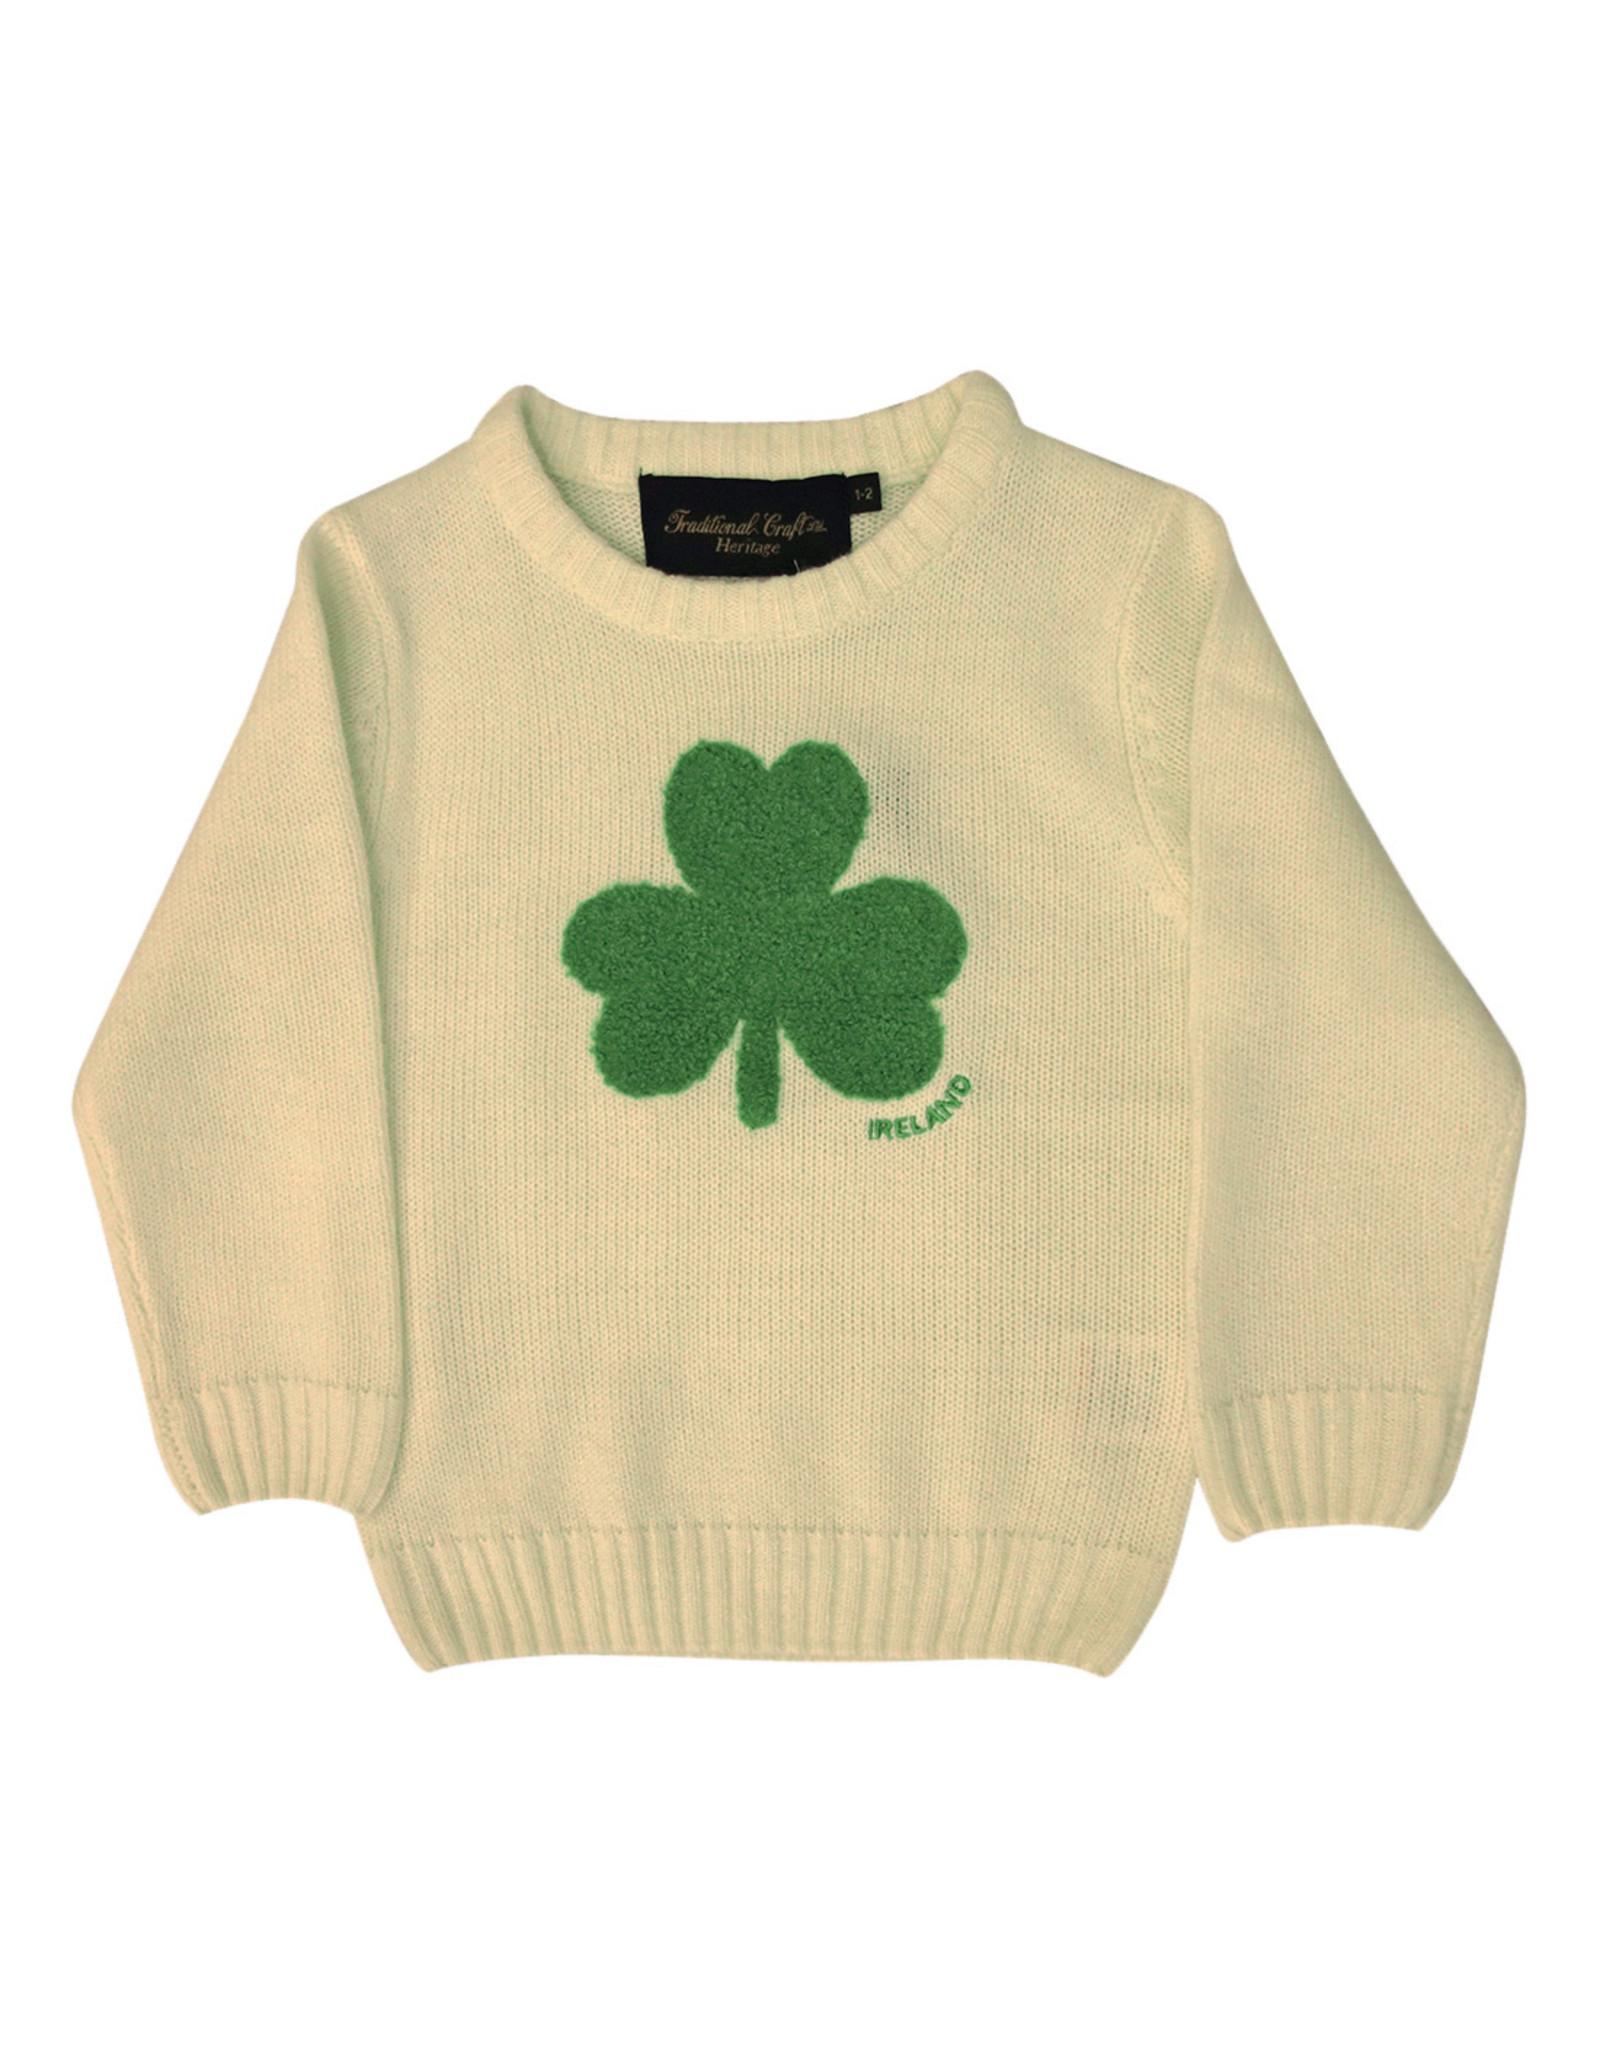 Traditional Craftwear Cream + Green Shamrock Sweater